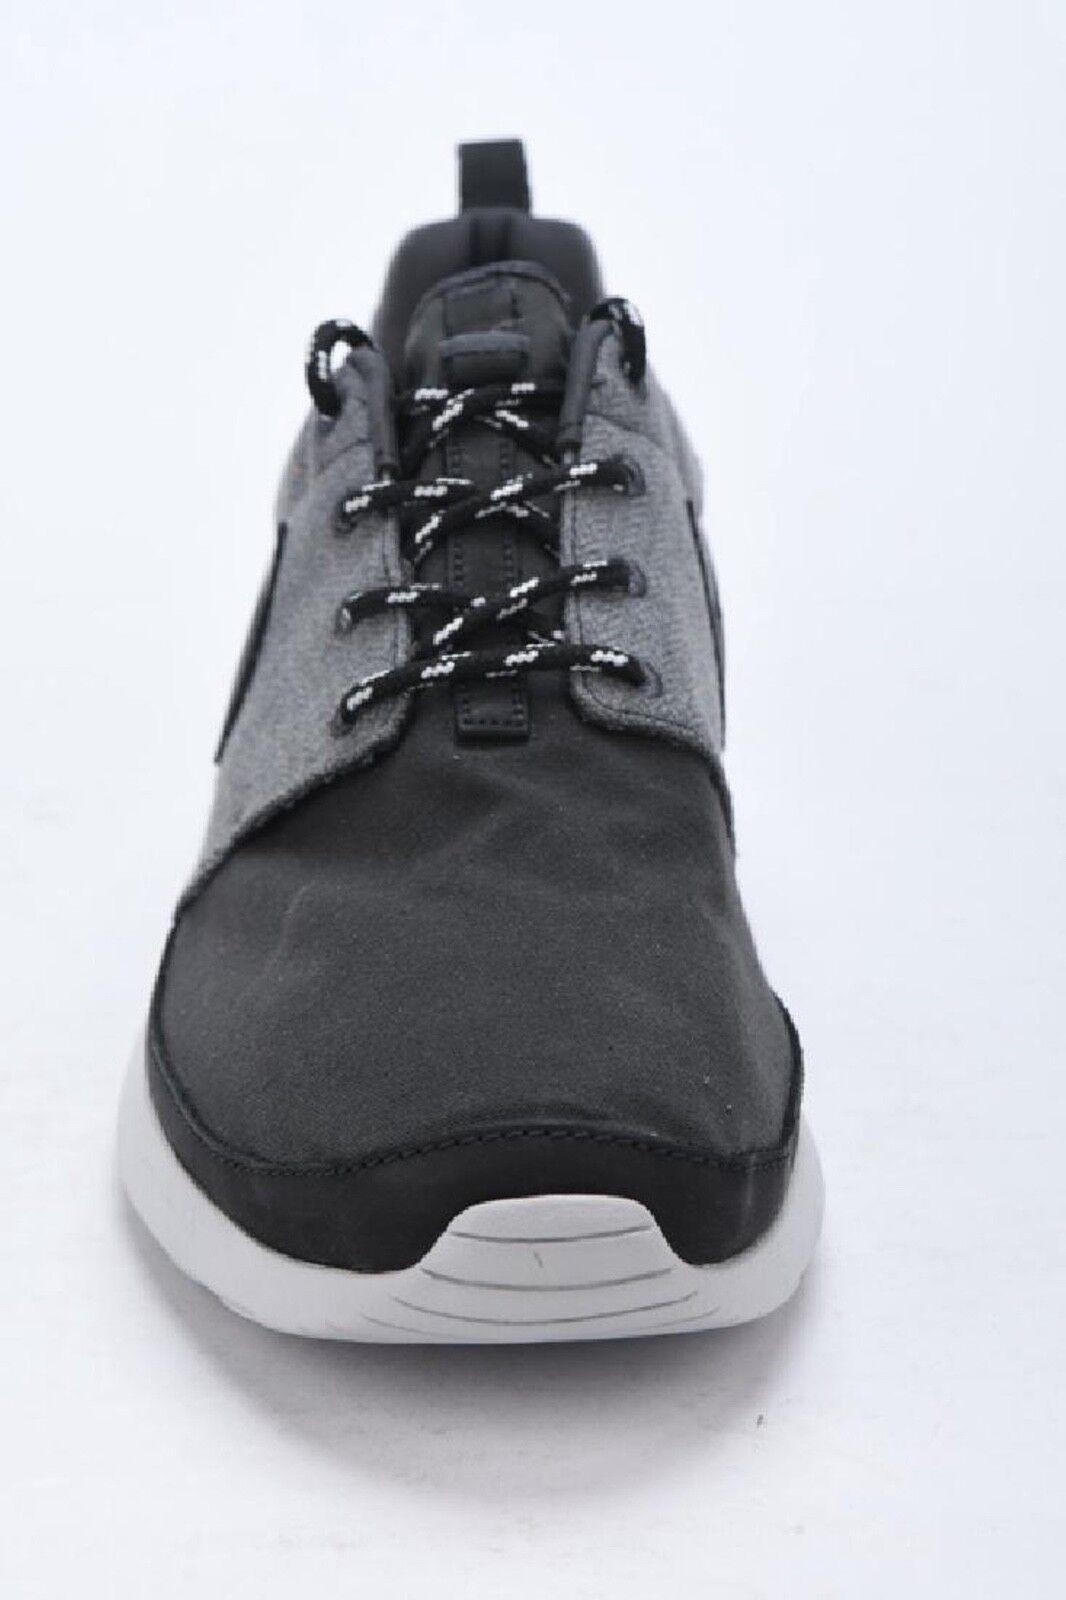 Nike rosherun premium premium premium nrg 580566-040 schwarz / graue sz10 ds 55cf38